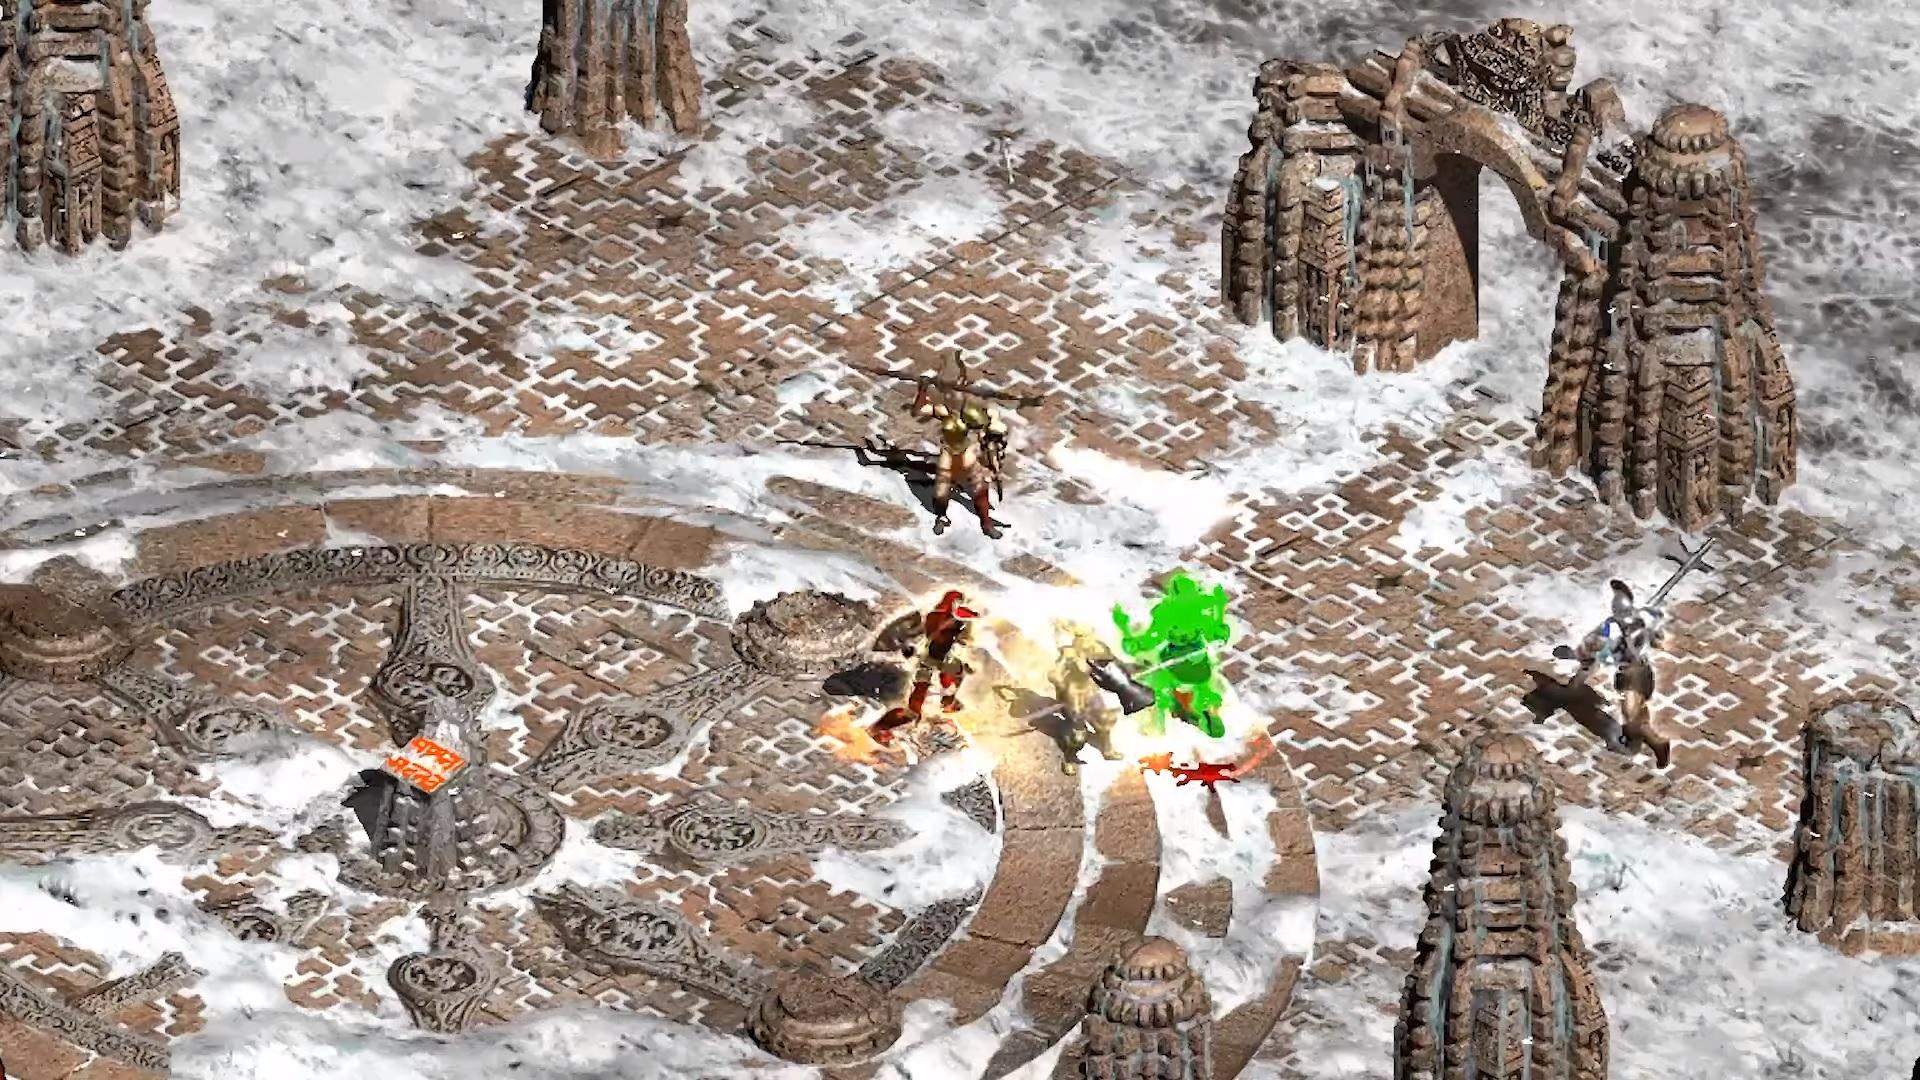 Fan remake Project Diablo 2 gets a second season of content next month